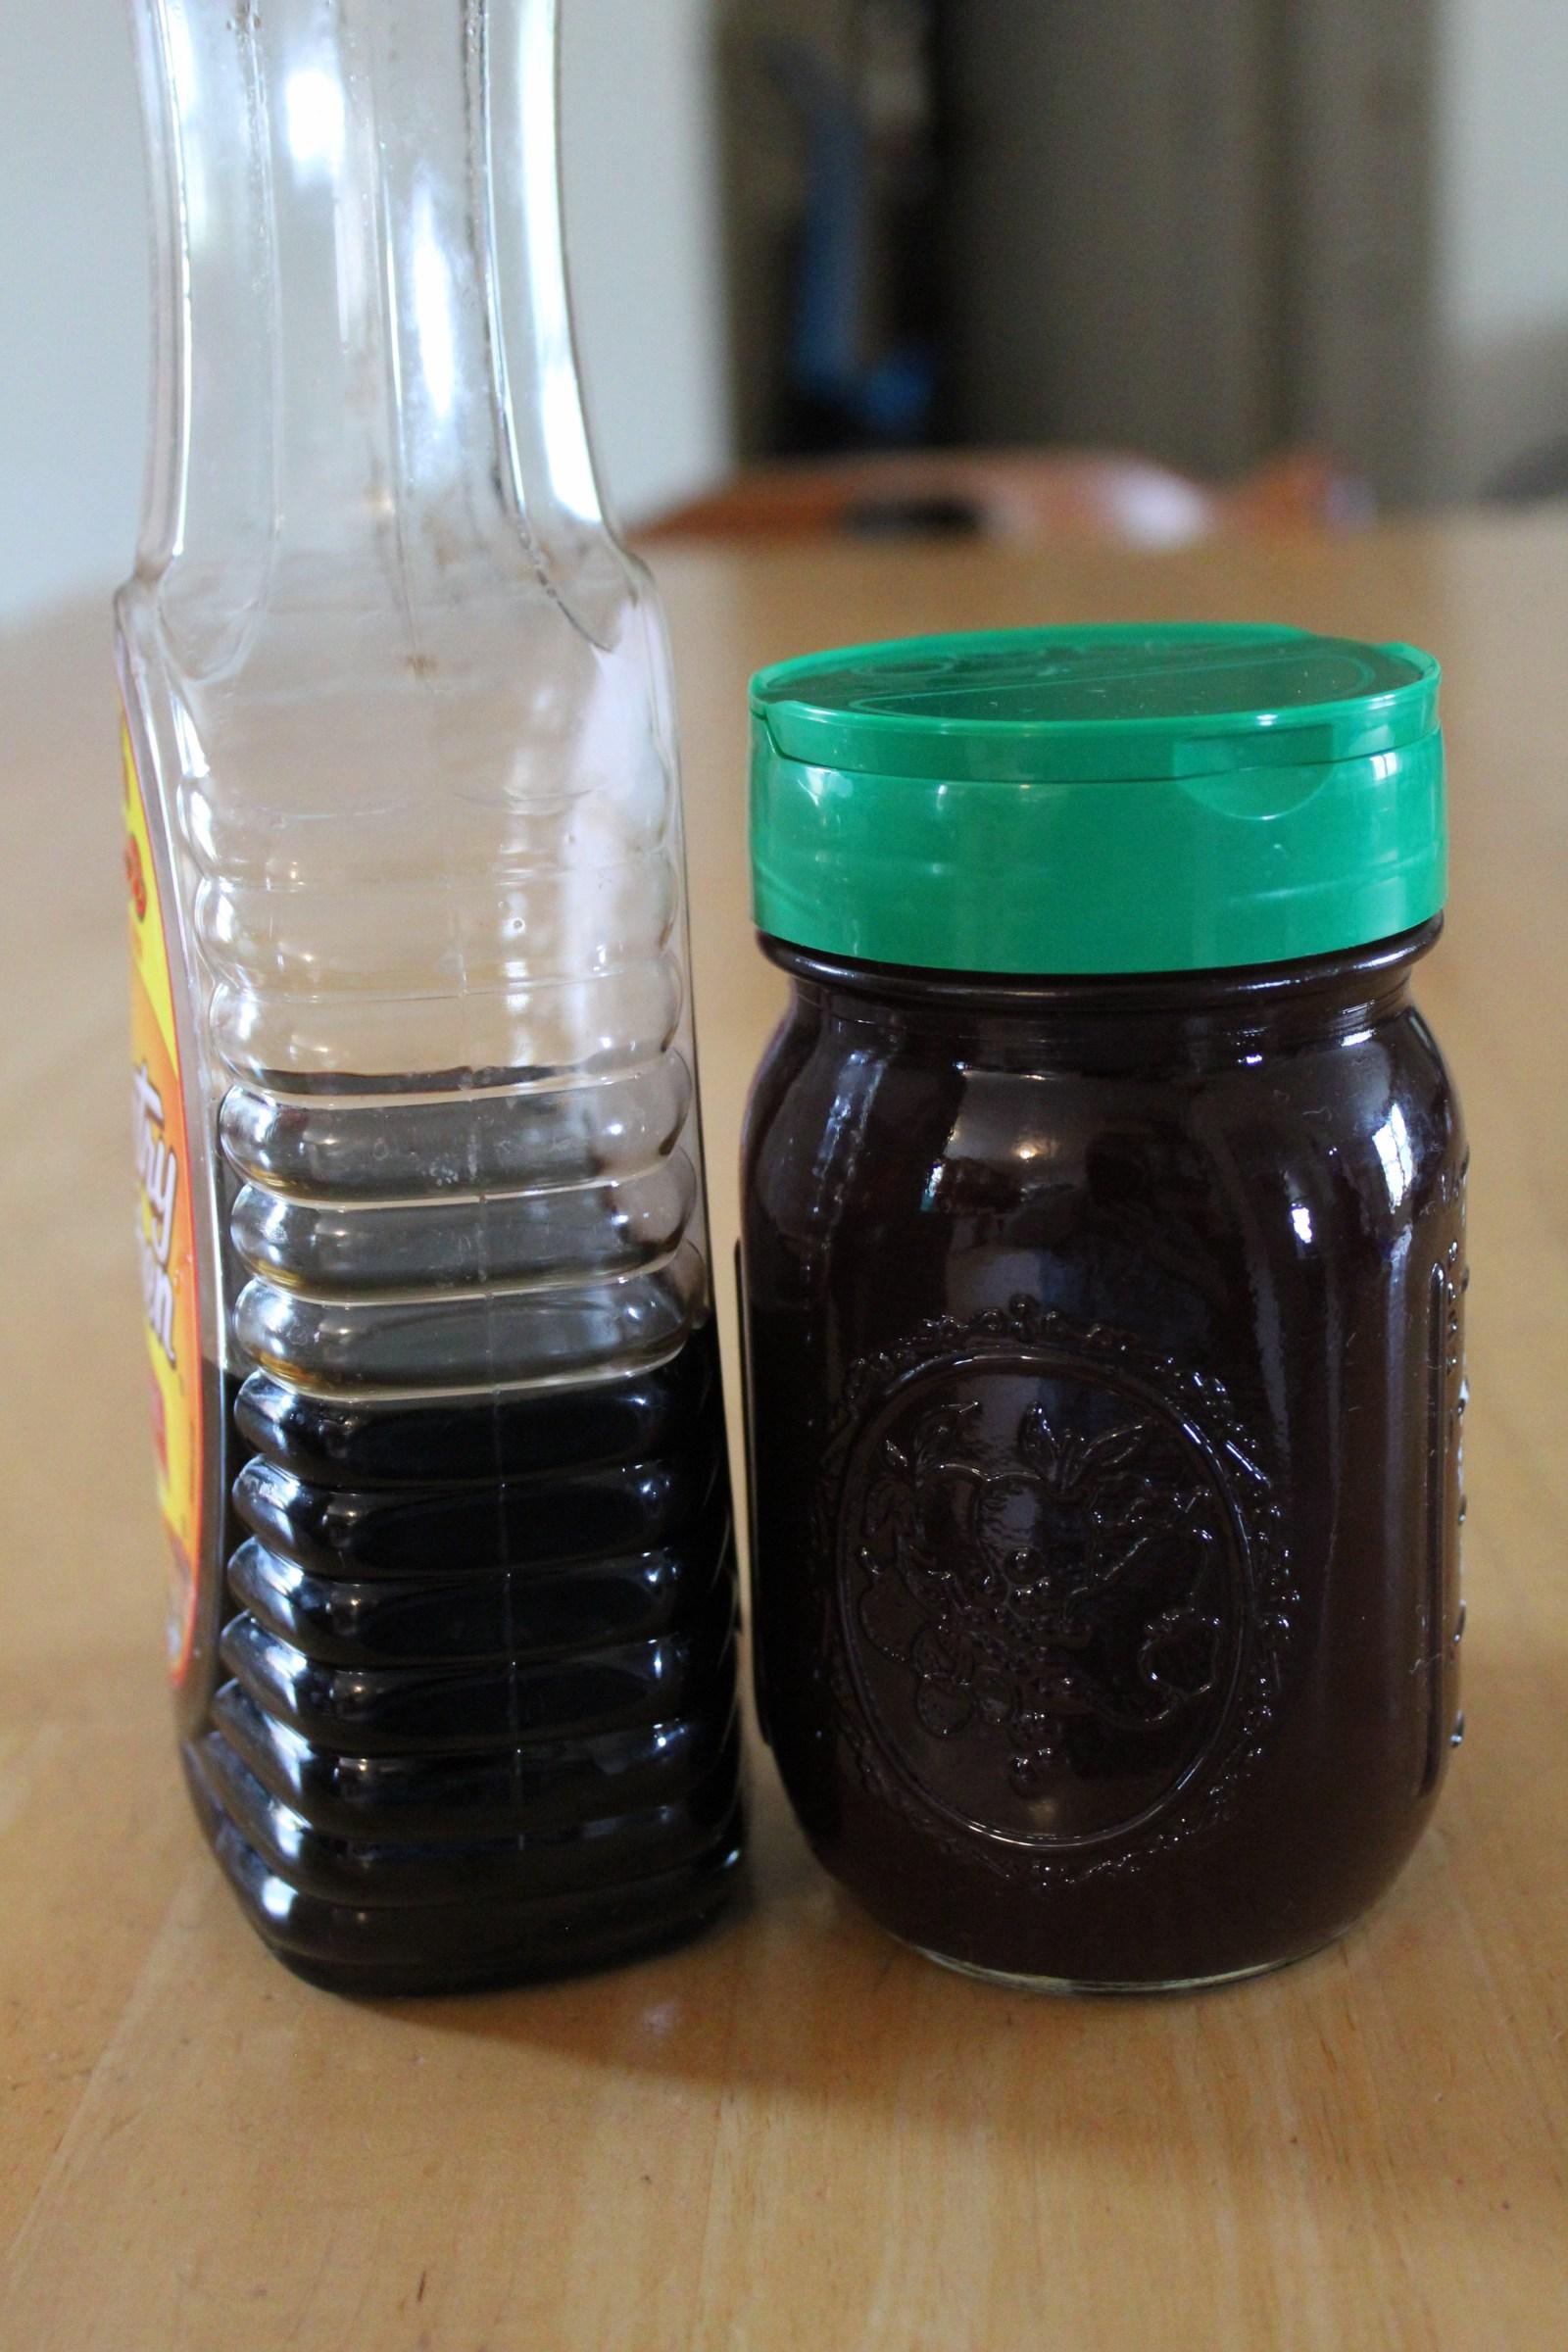 pancake syrup and chocolate syrup